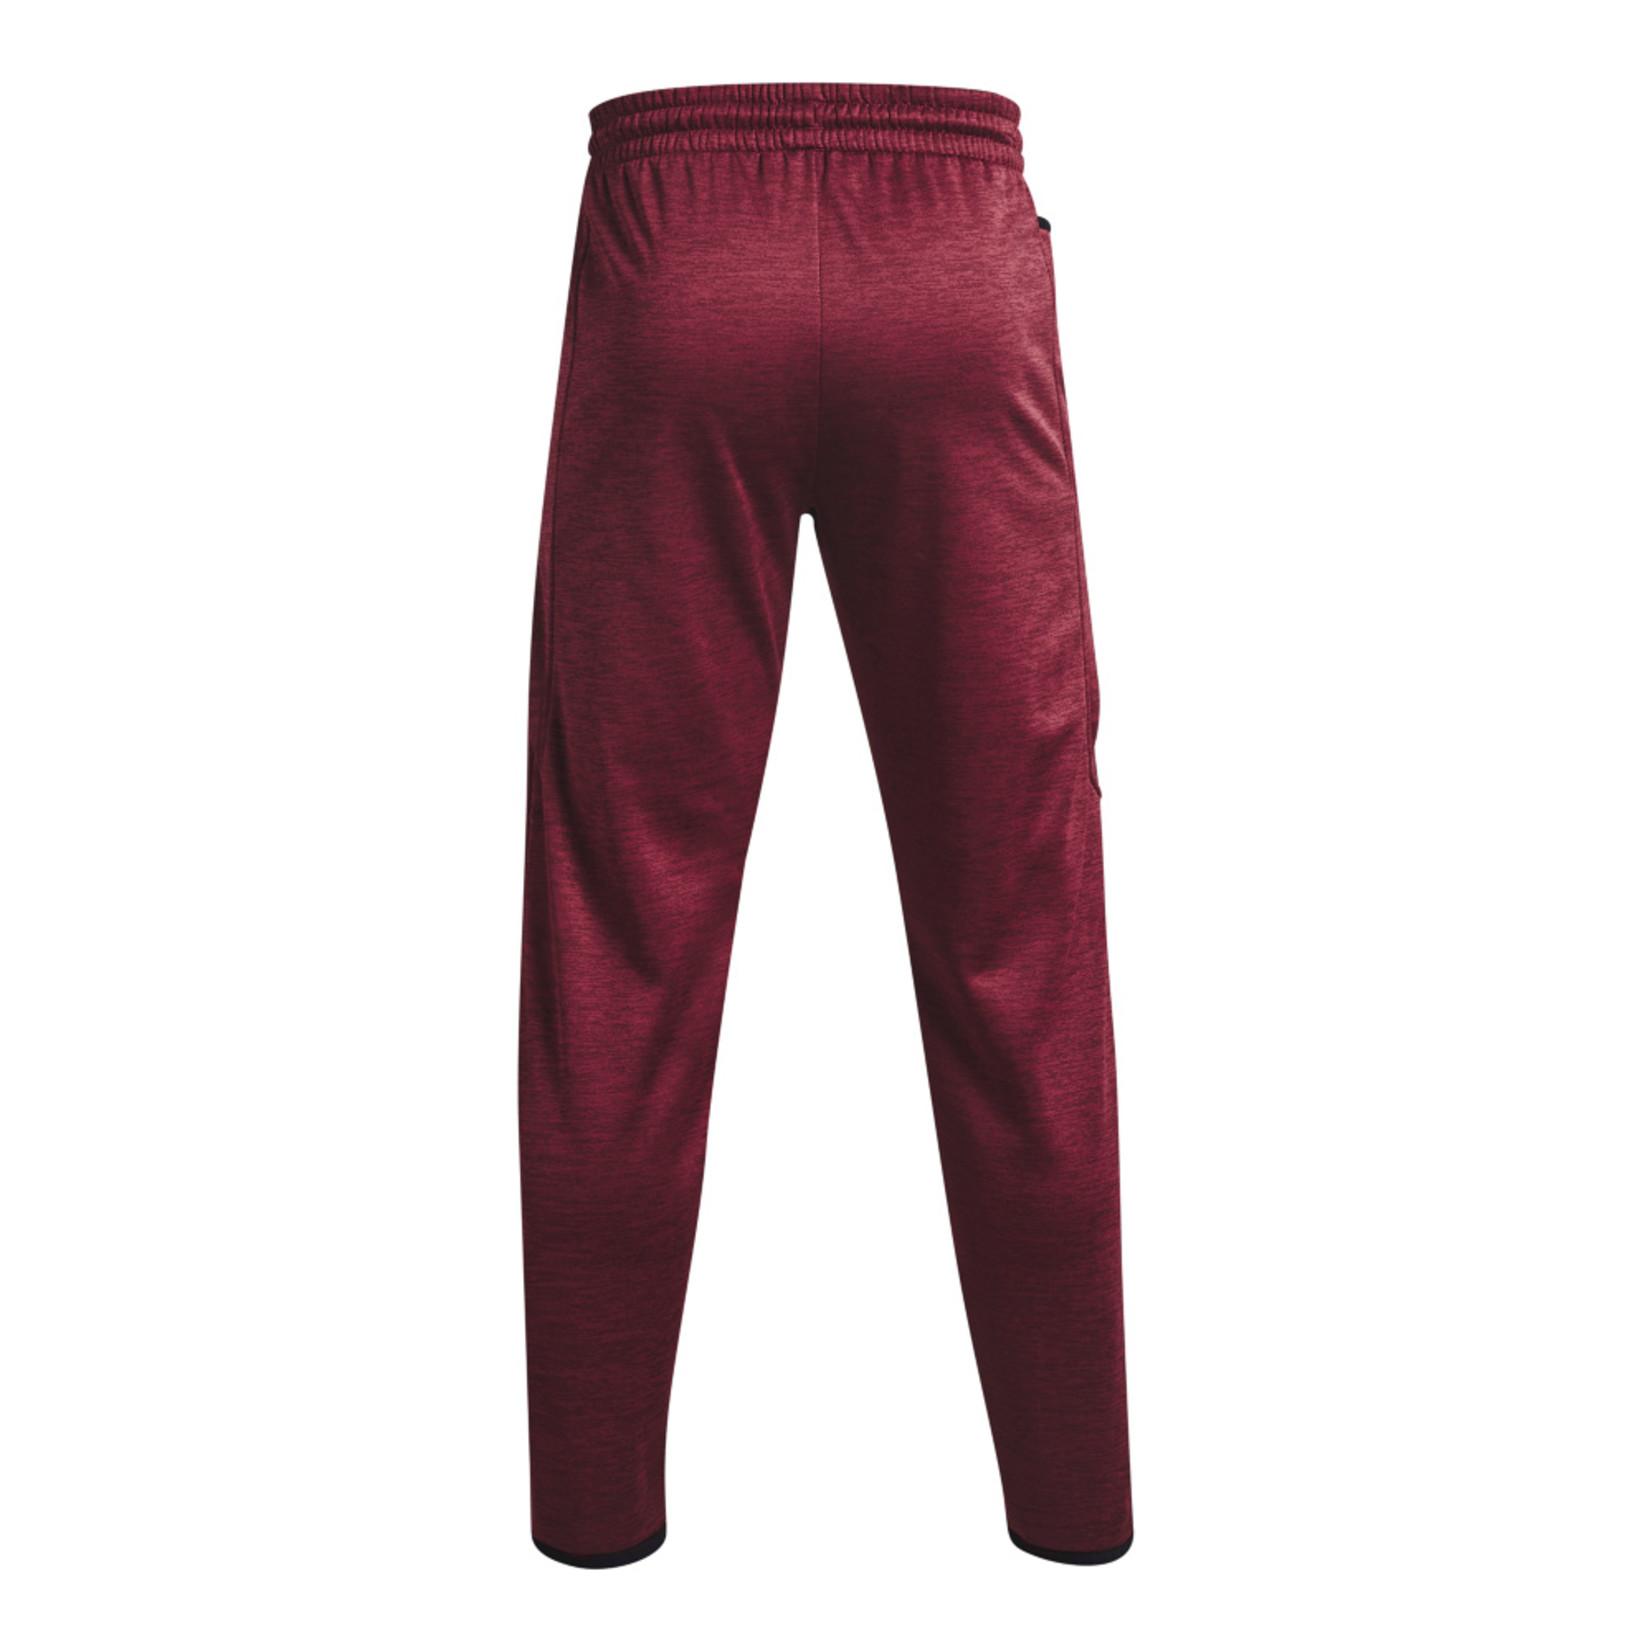 Under Armour UA Armour Fleece Twist Pants-Red